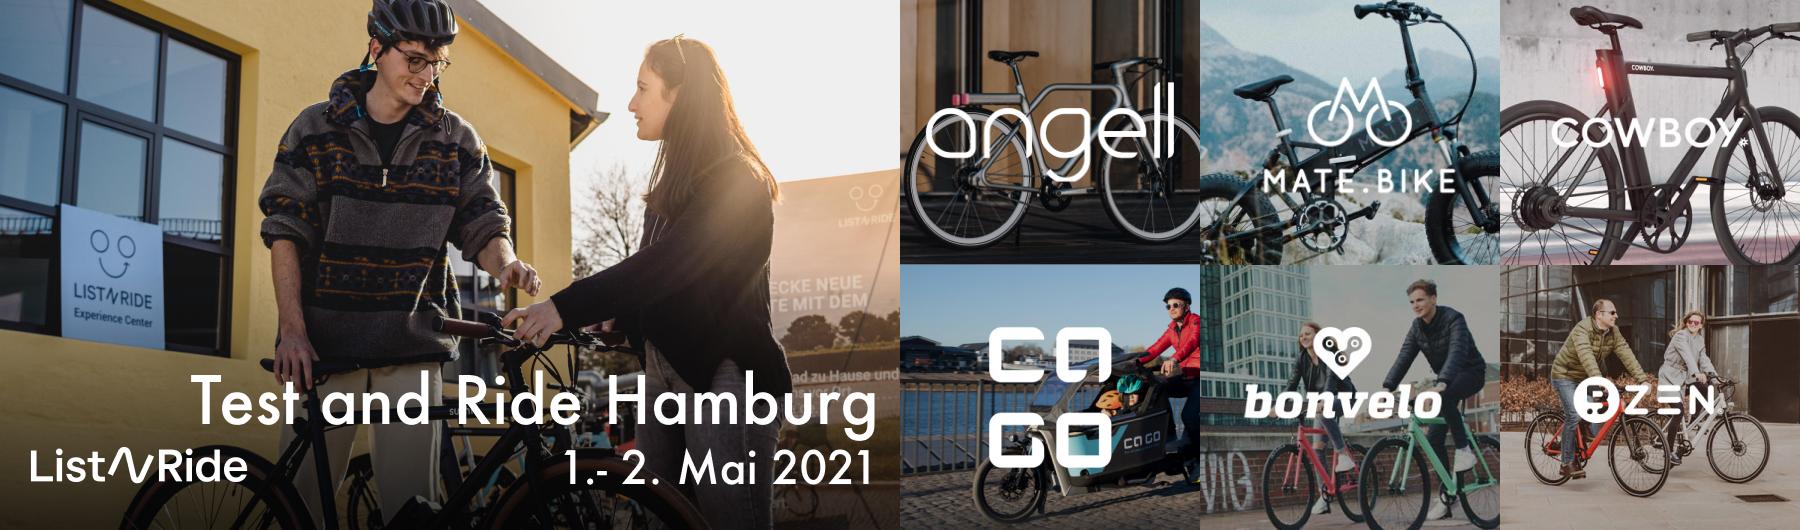 Test and Ride Hamburg